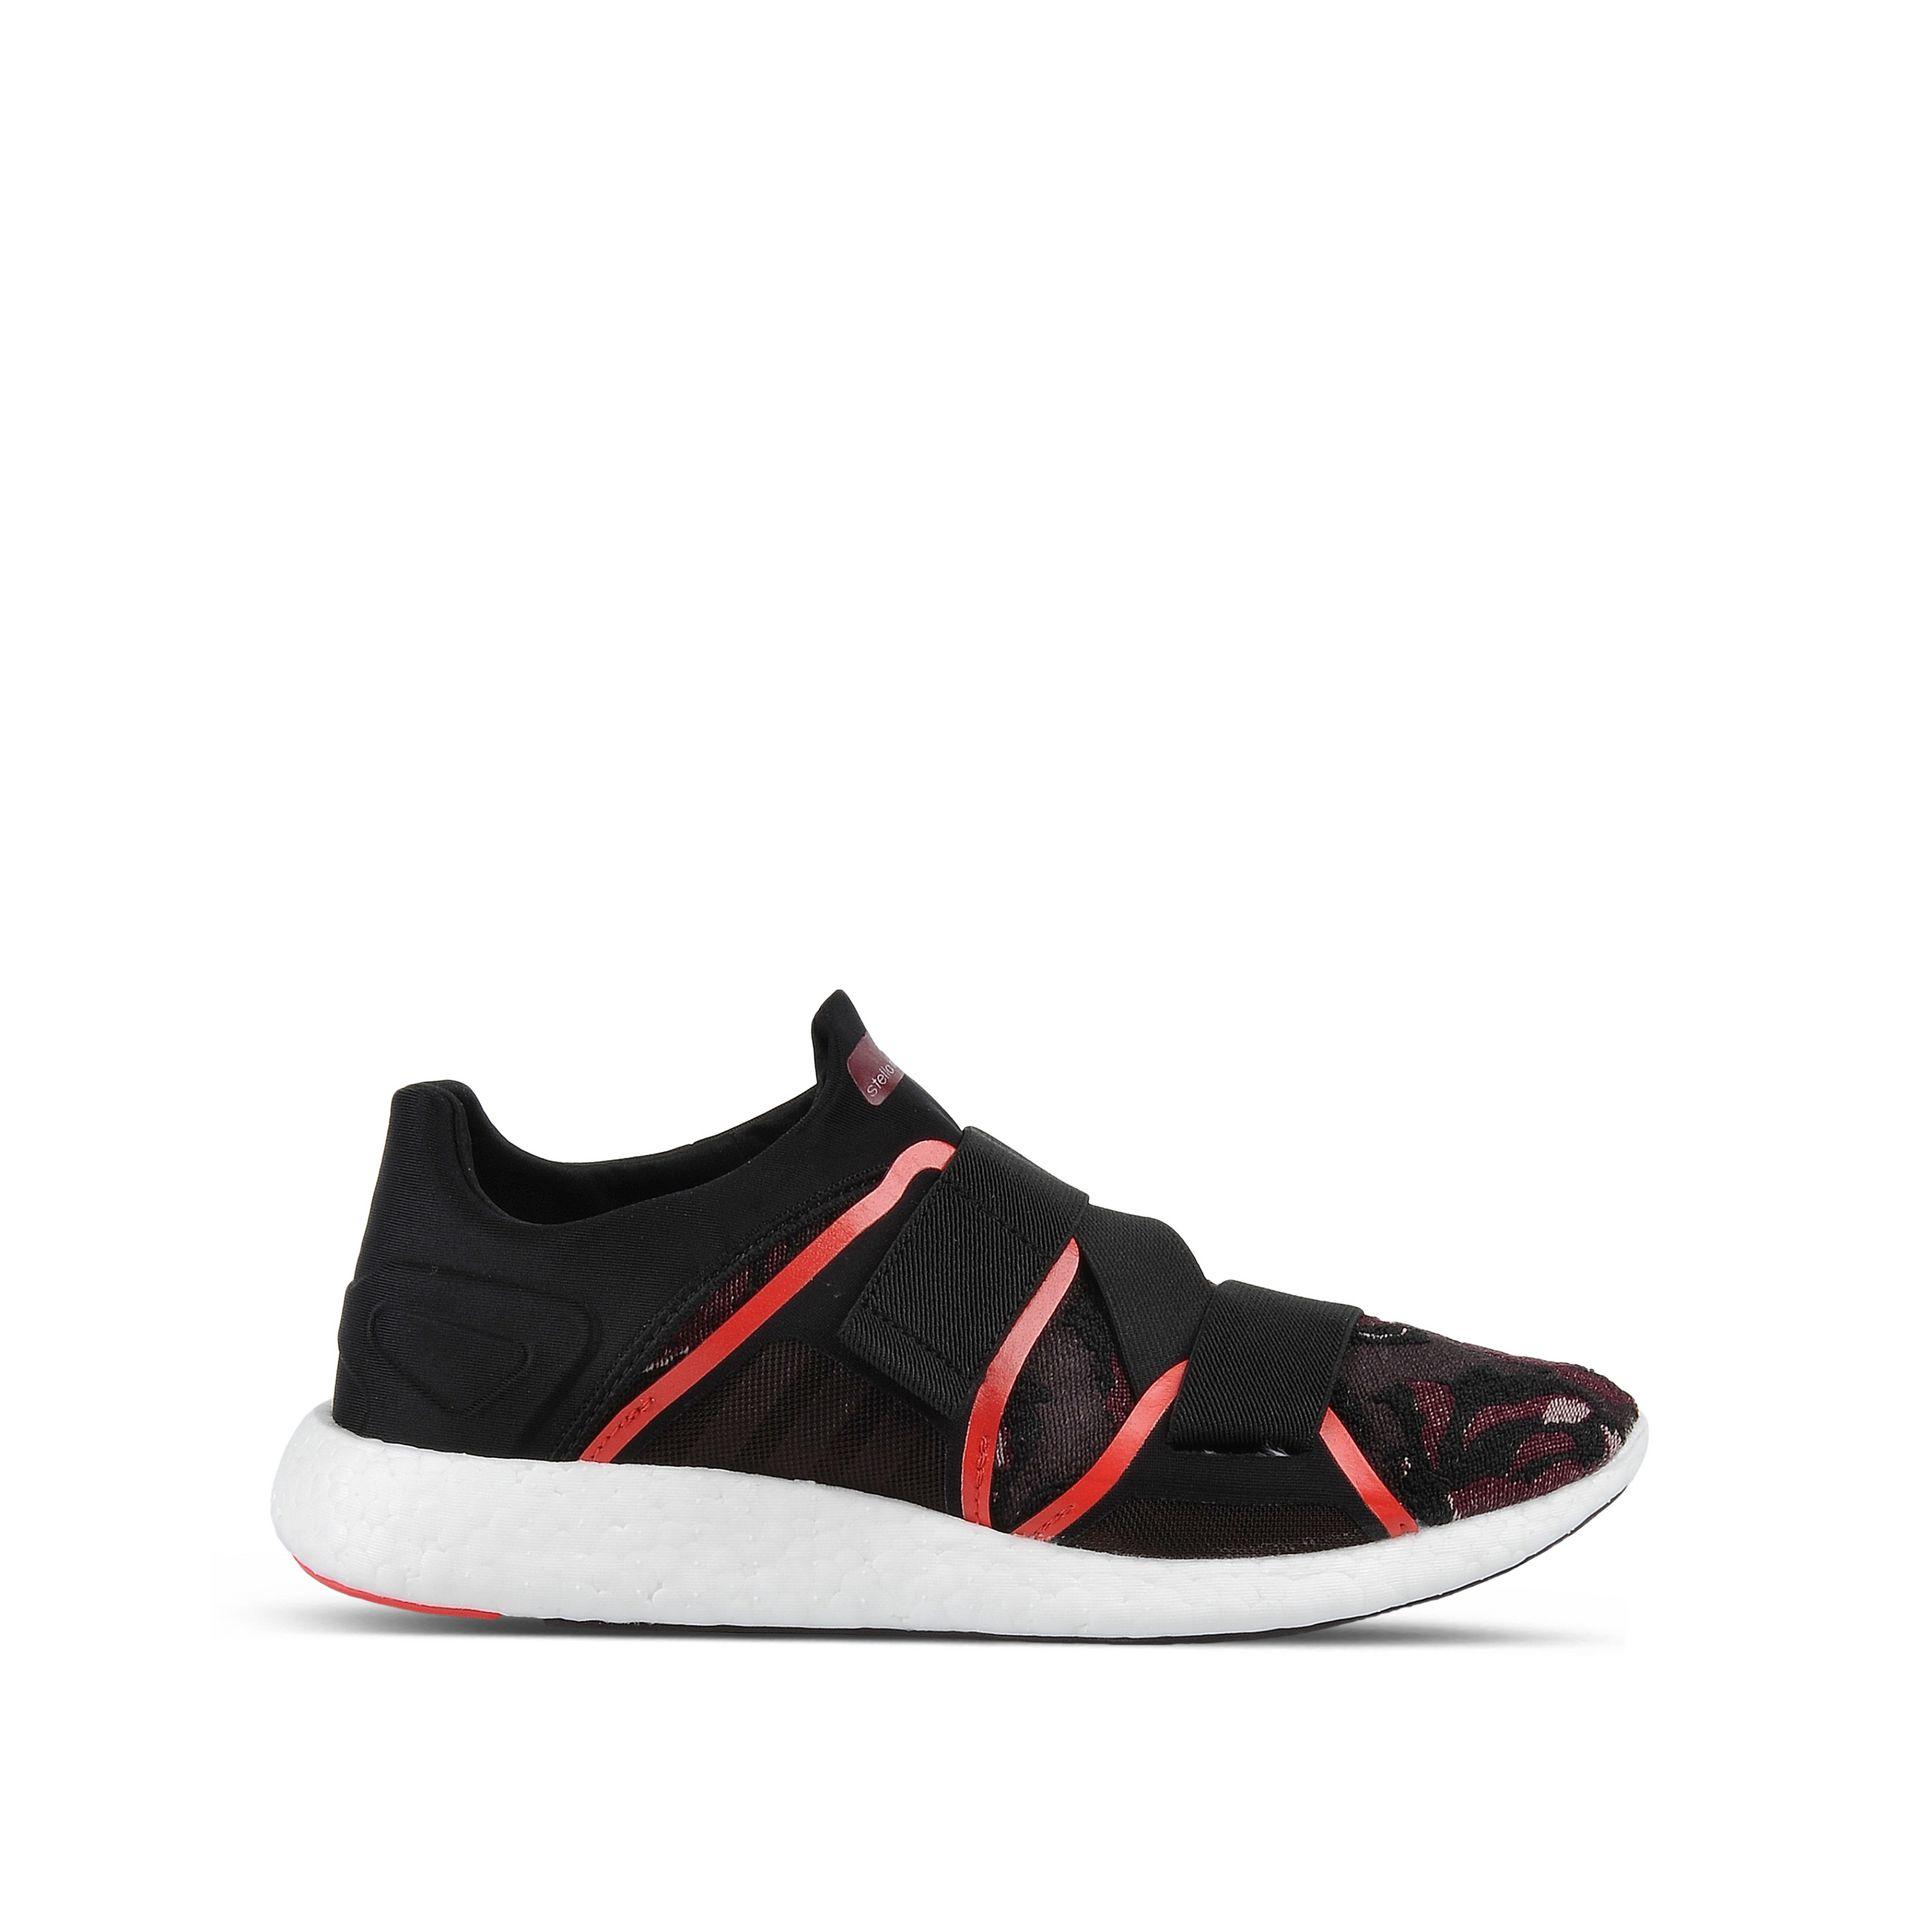 adidas by stella mccartney ararauna dance shoes in black lyst. Black Bedroom Furniture Sets. Home Design Ideas